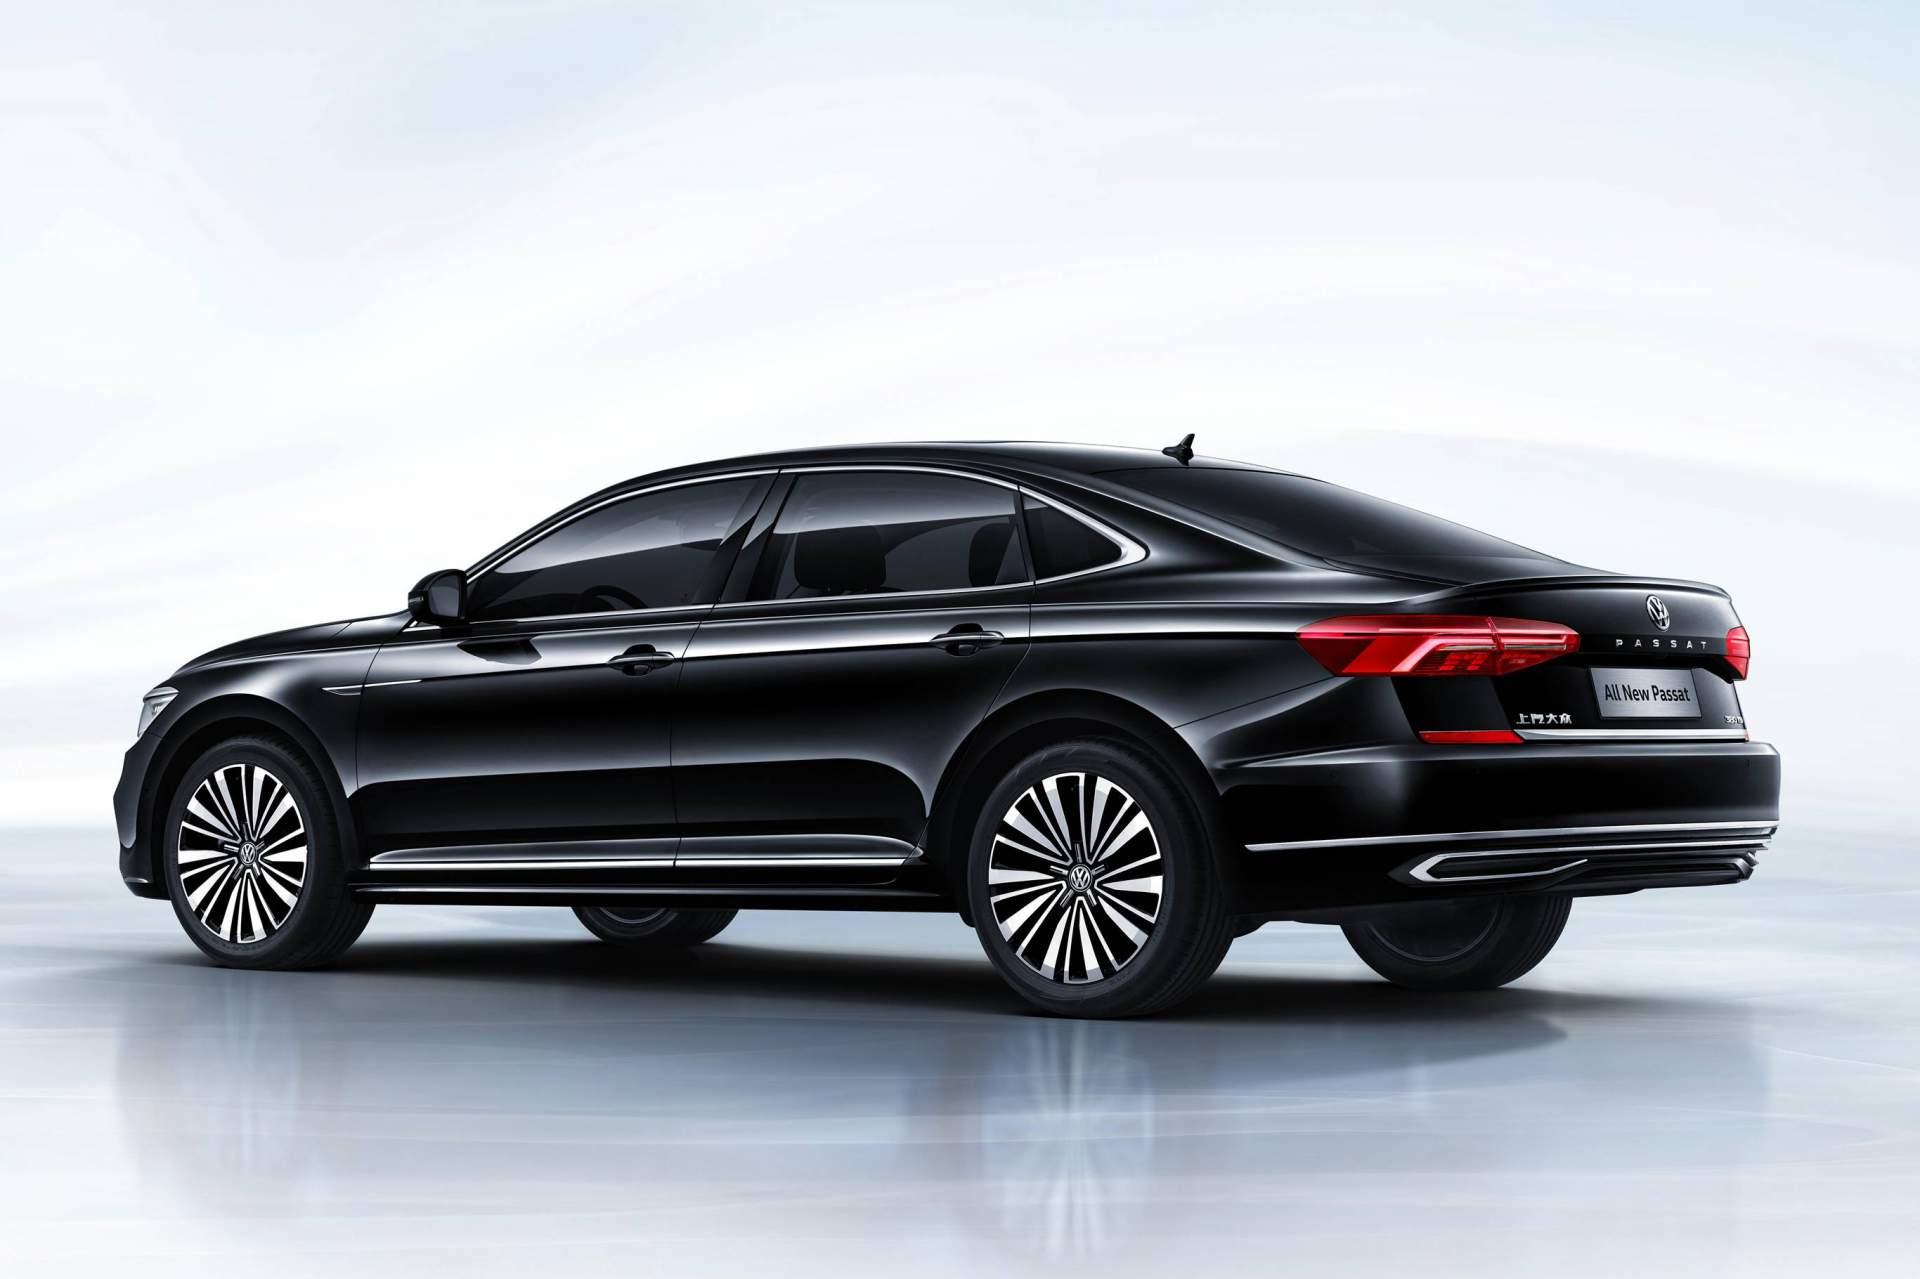 2019 Volkswagen Passat Revealed In China, Previews U.S ...